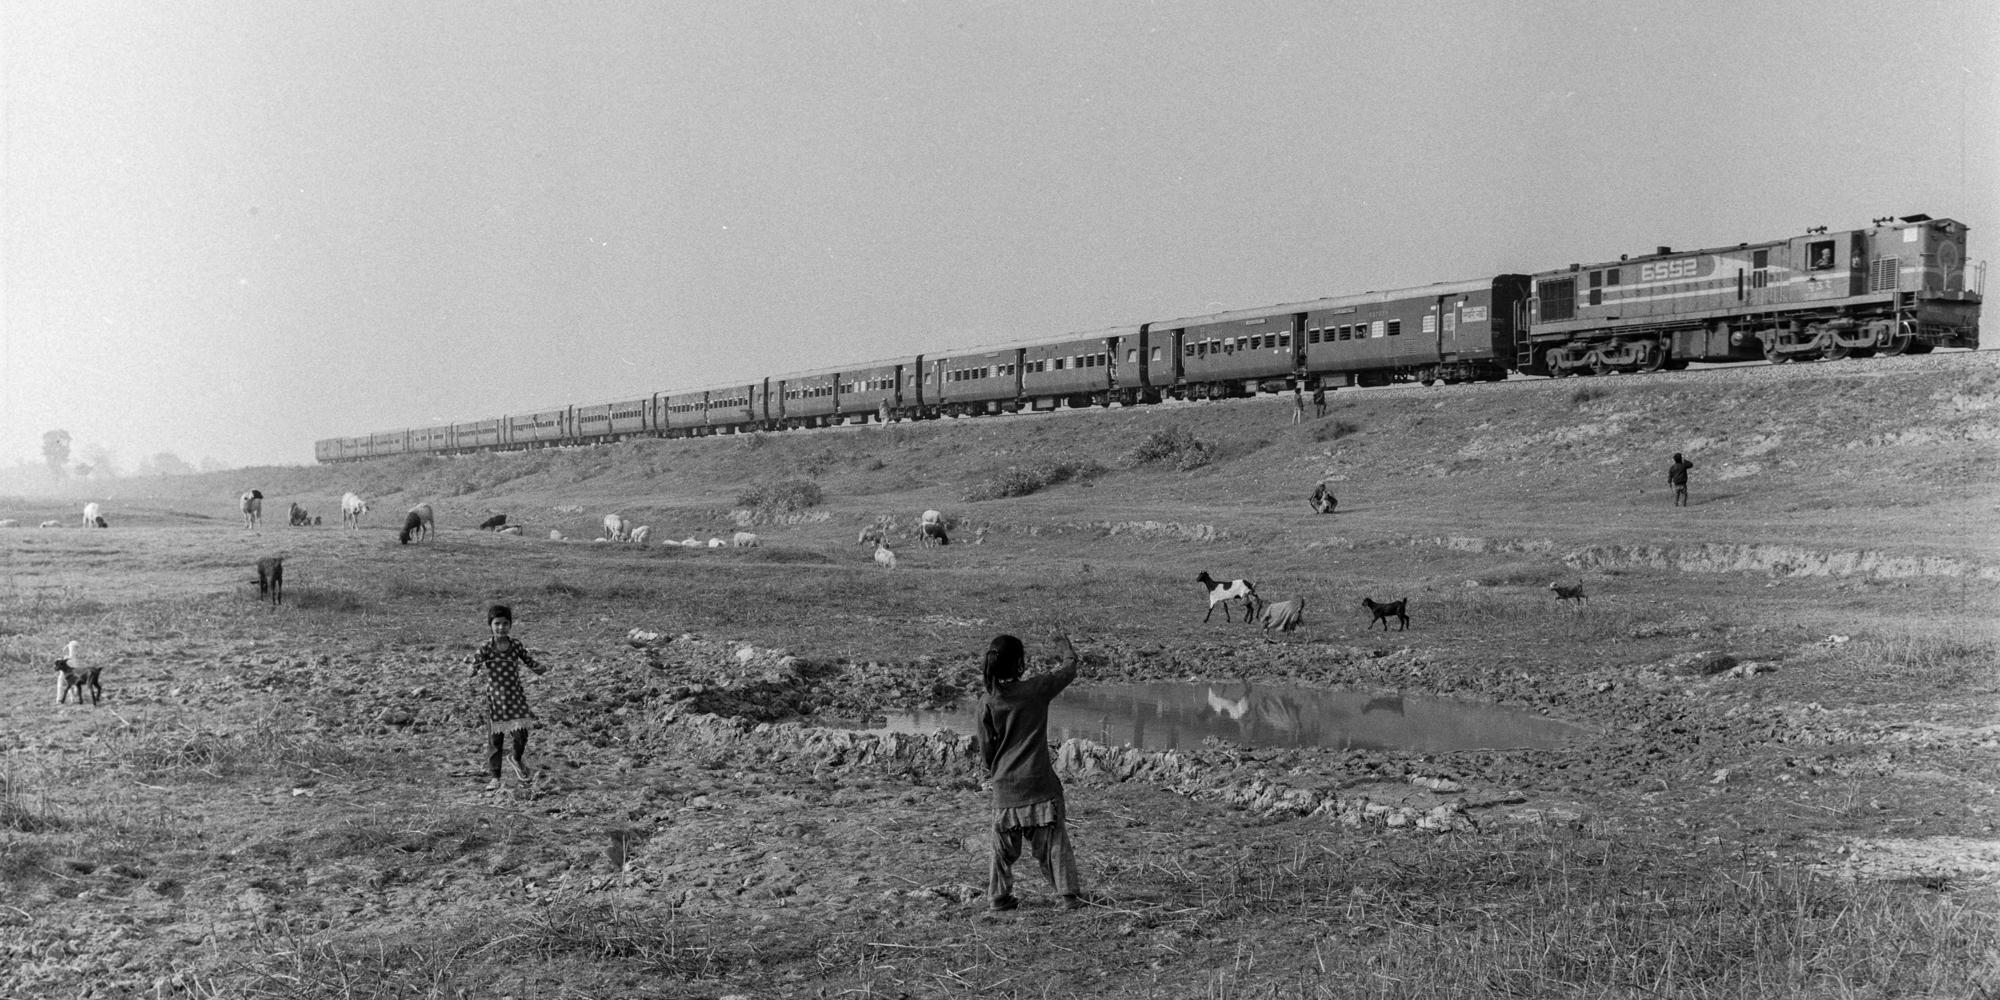 Child waving at train